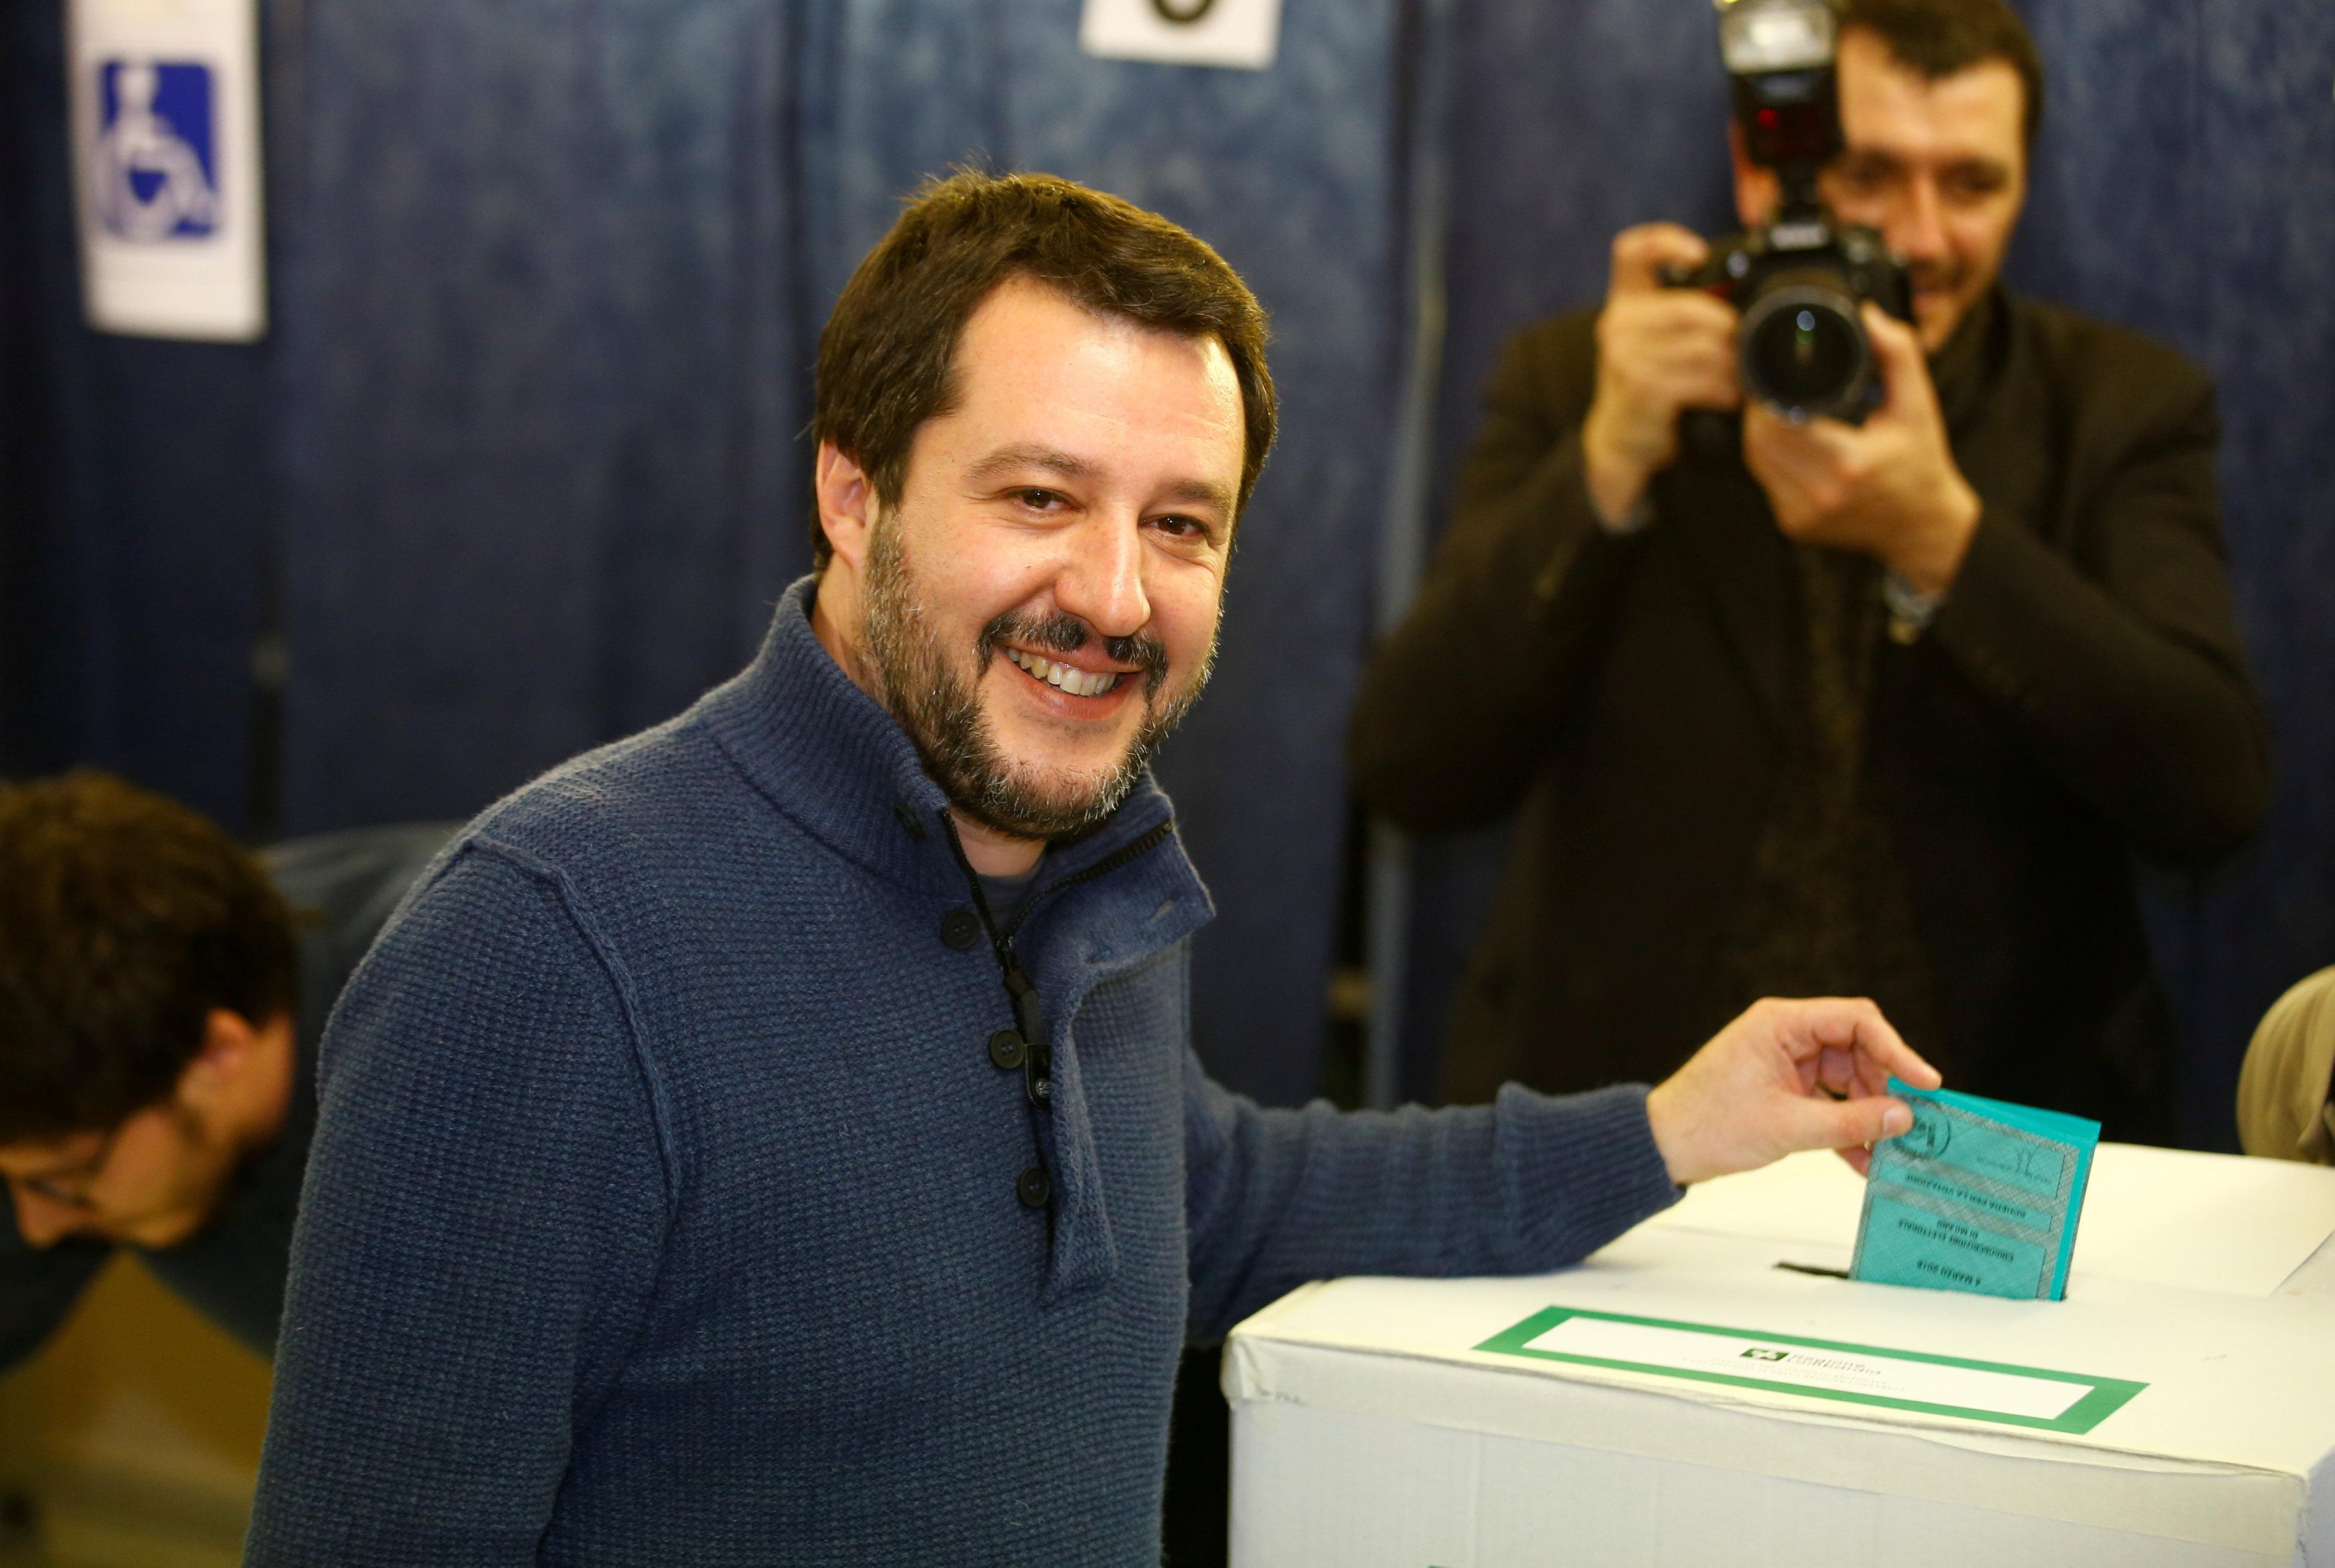 (REUTERS/Stefano Rellandini)